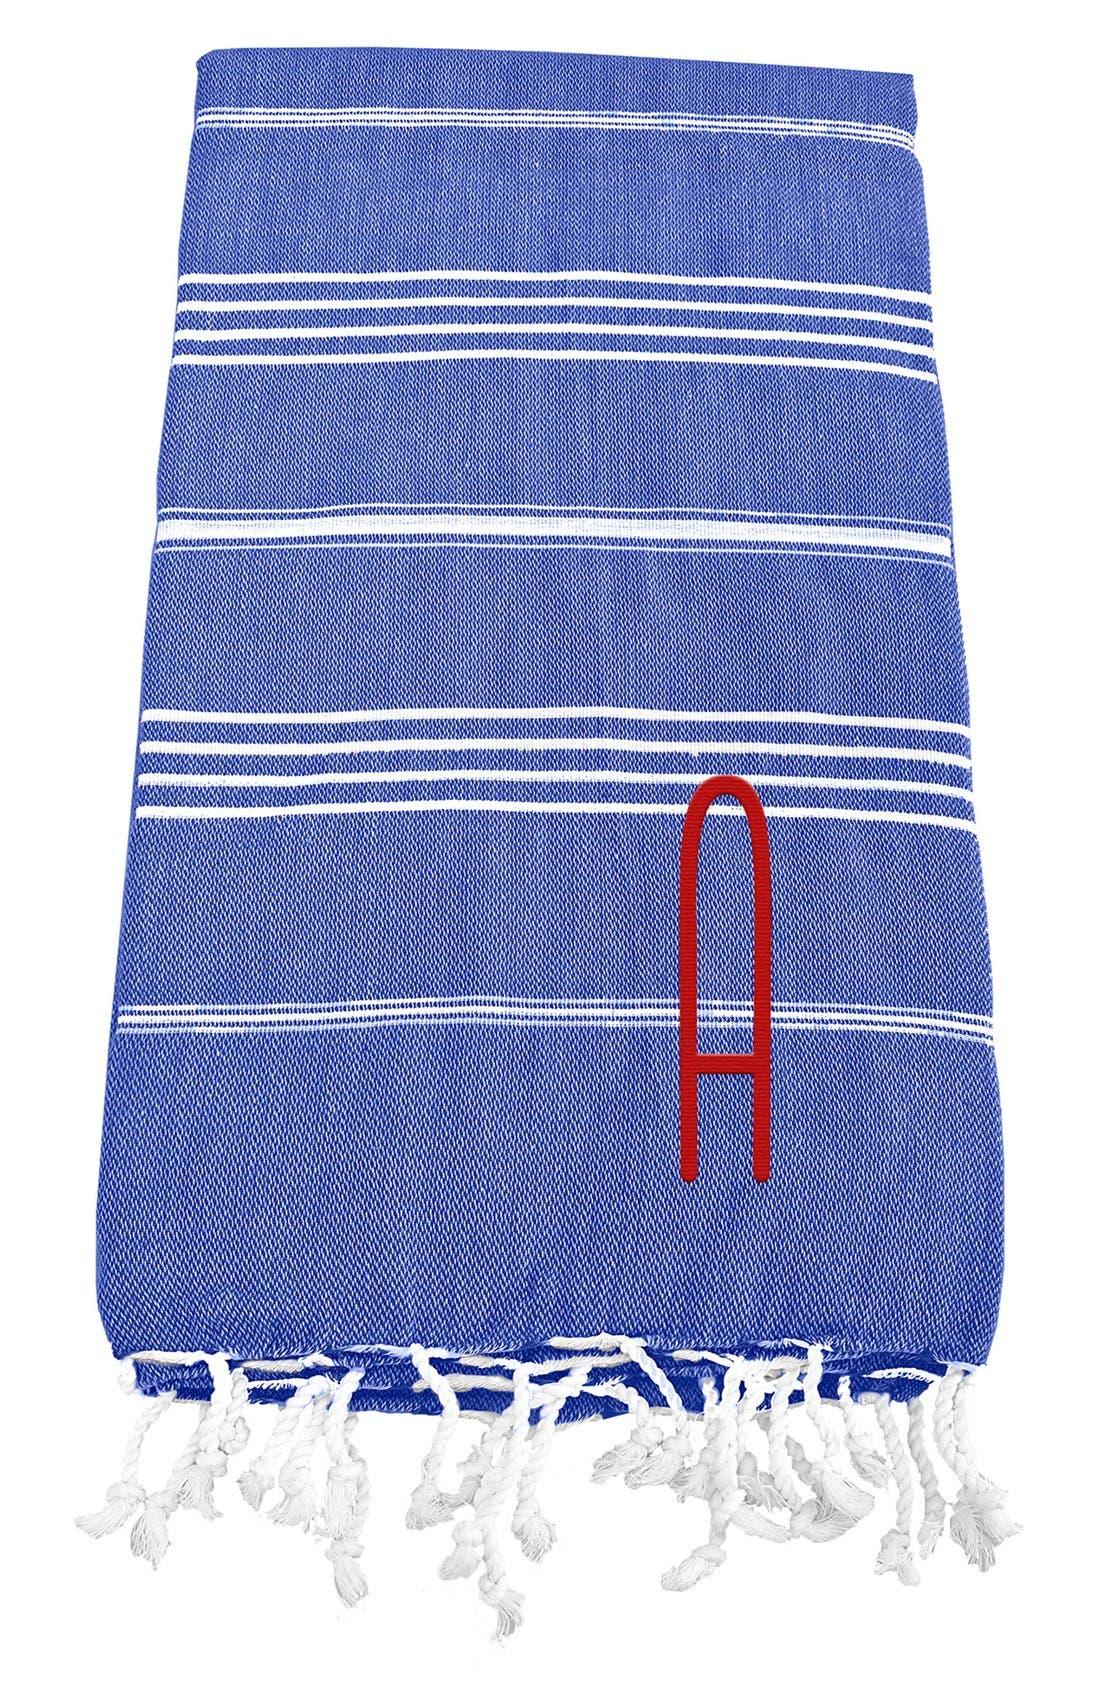 Monogram Turkish Cotton Towel,                             Main thumbnail 57, color,